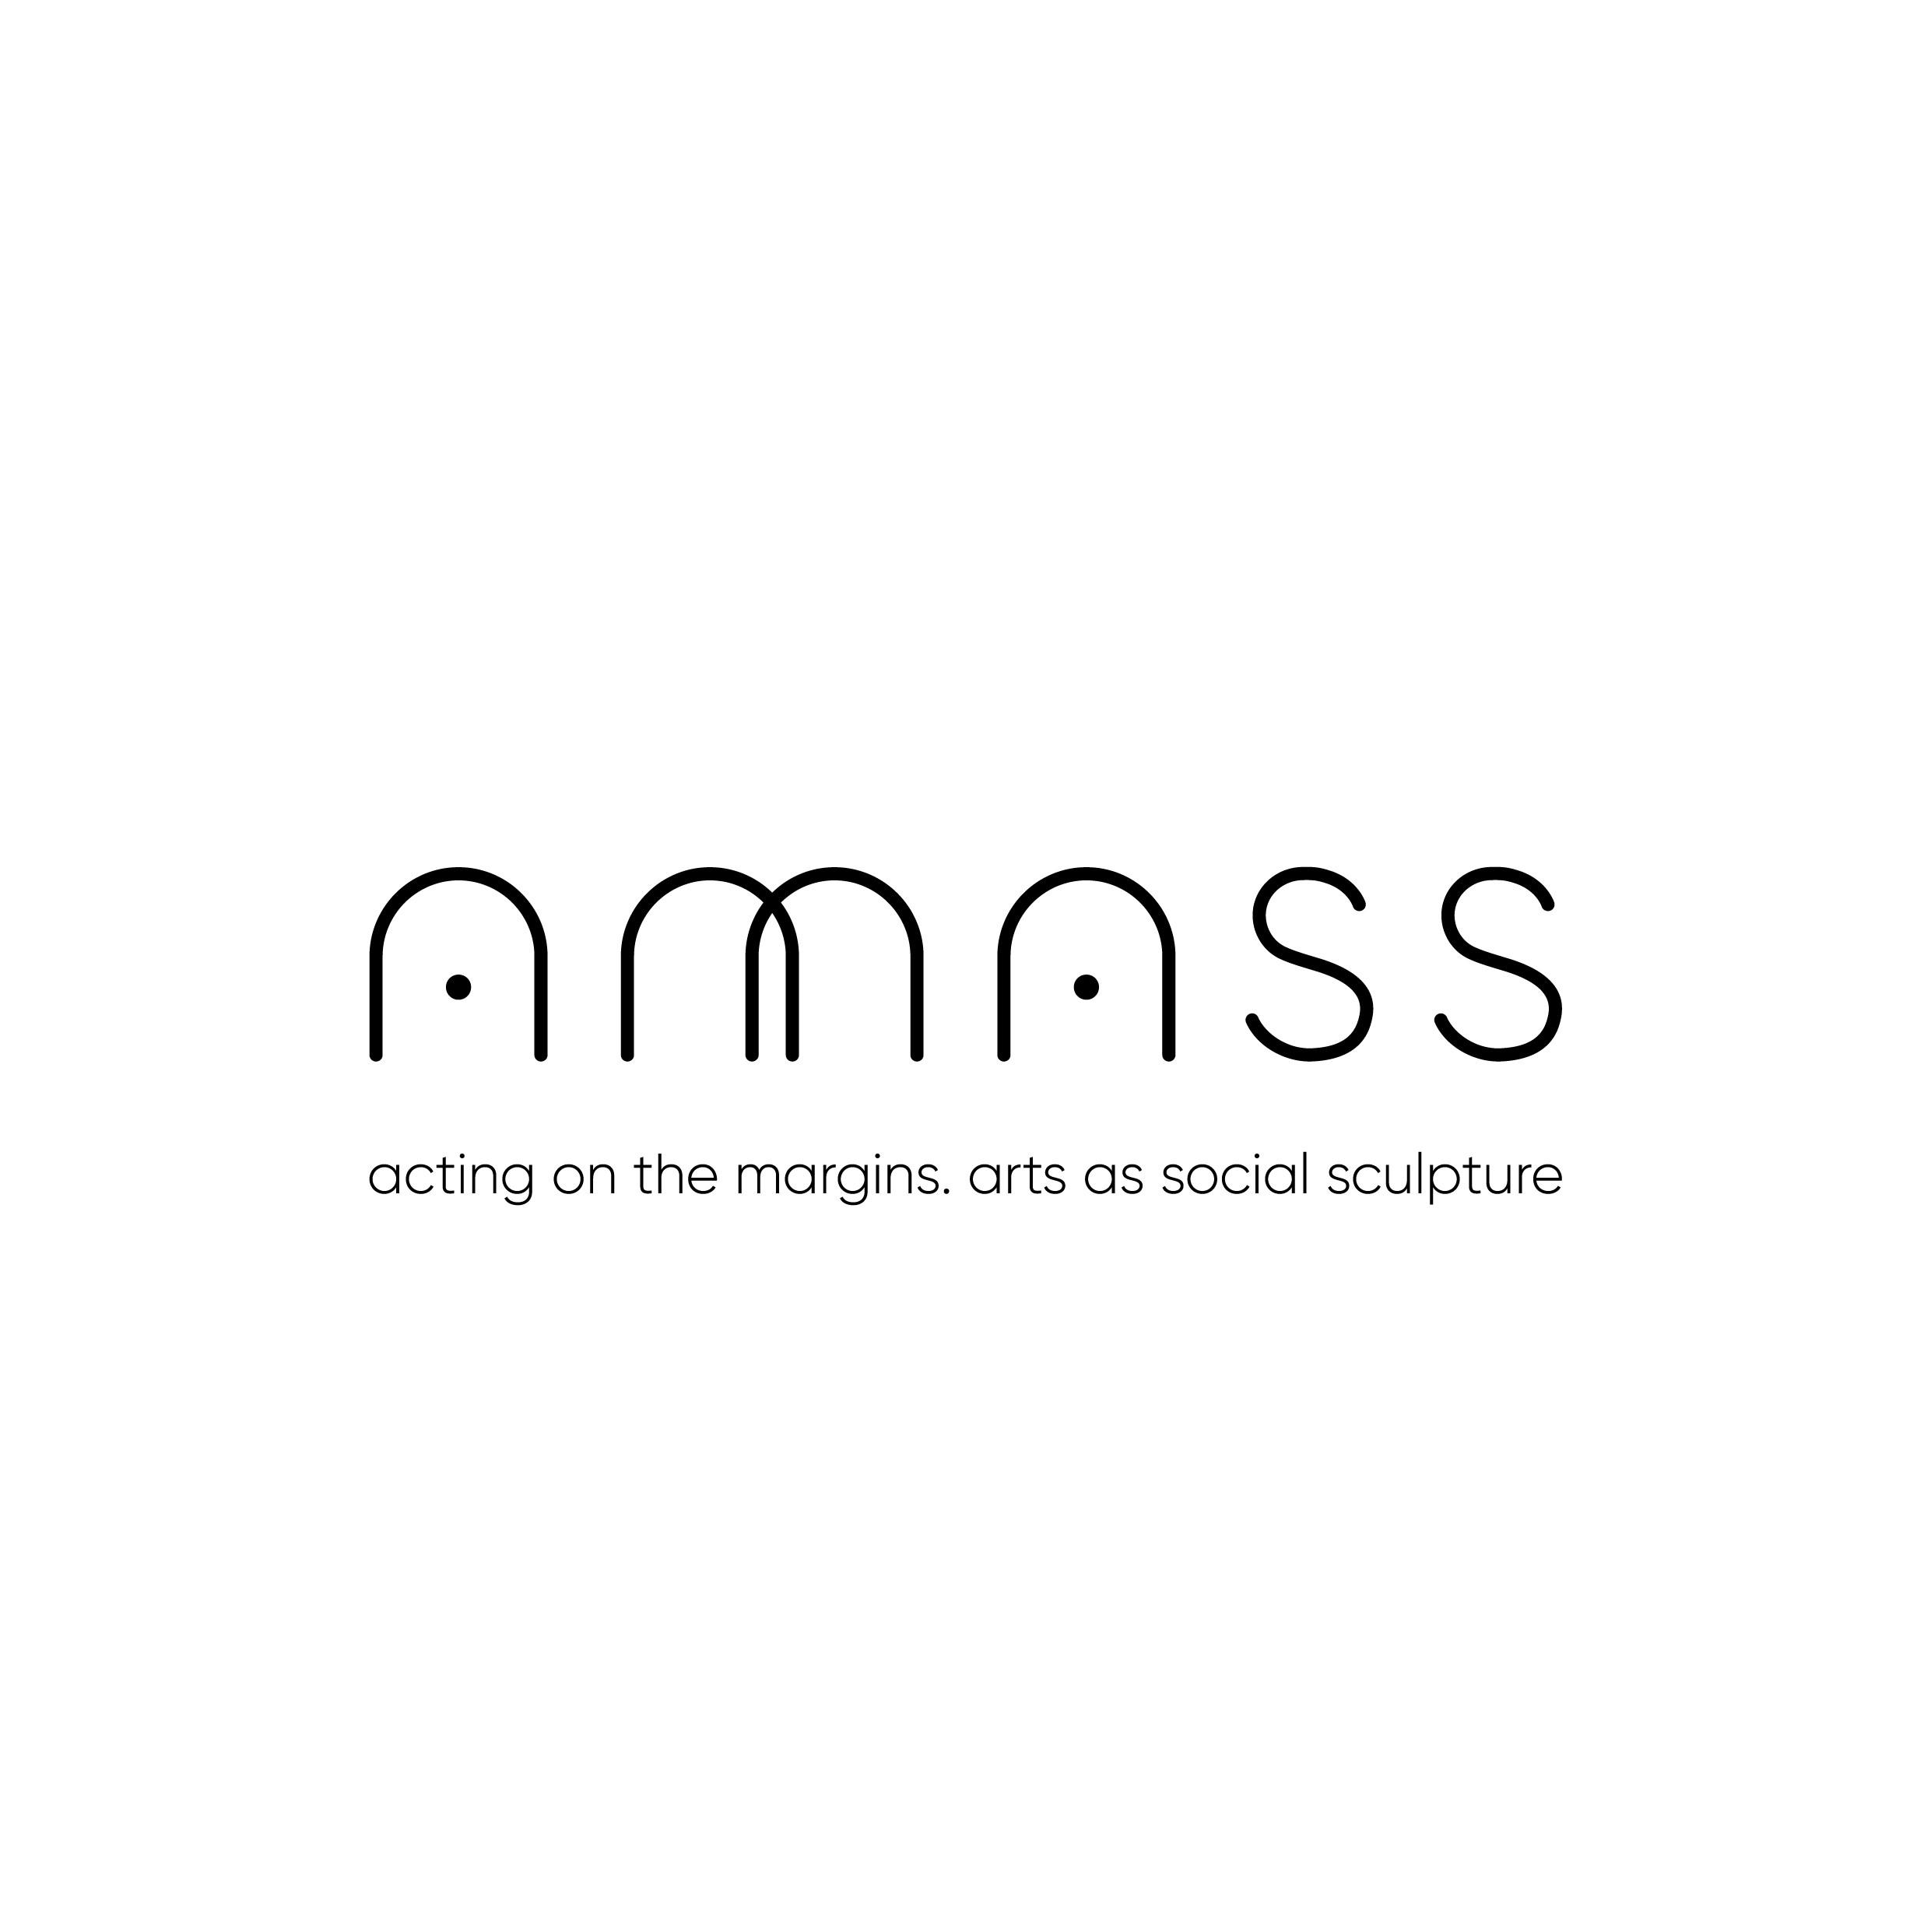 amass_logo.jpg